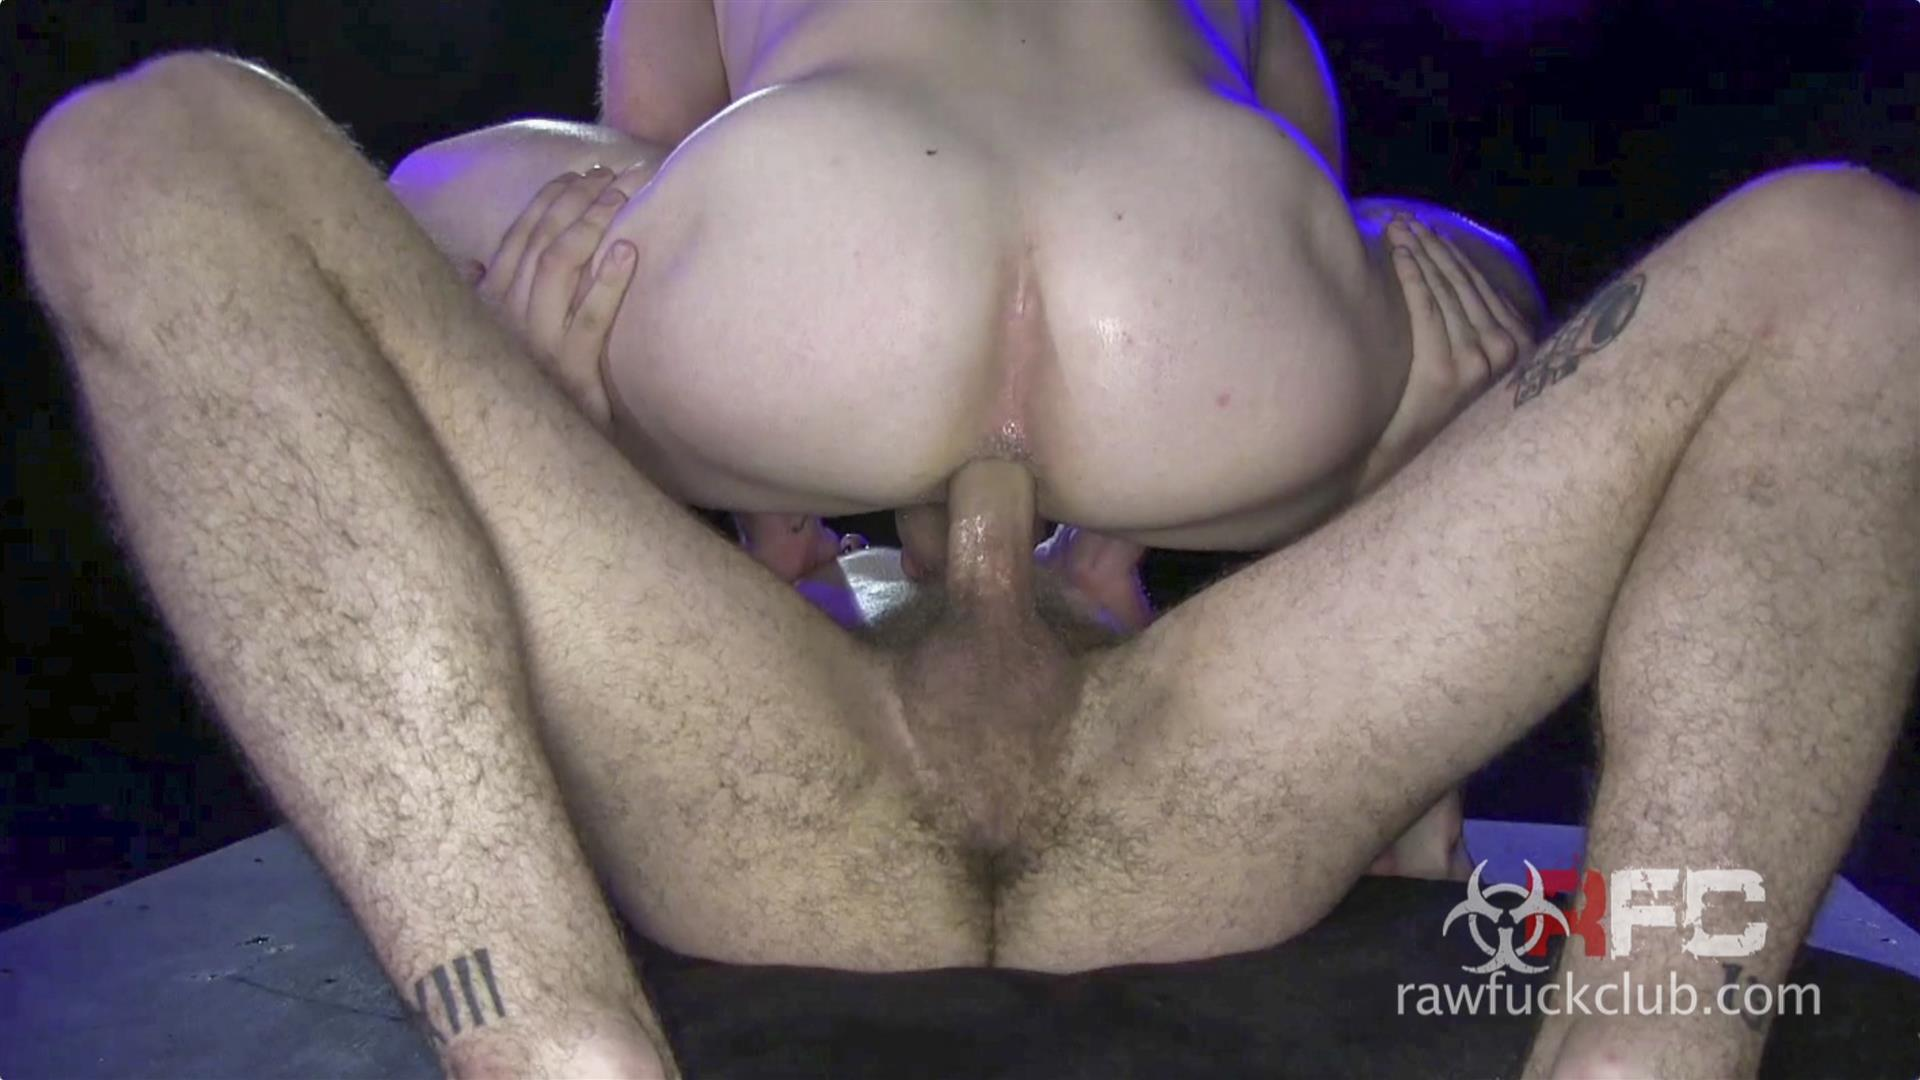 Raw Fuck Club Saxon West and Luke Harding Big Dick Bareback Sex Amateur Gay Porn 4 Luke Harding Breeding Saxon Wests Muscular Ass